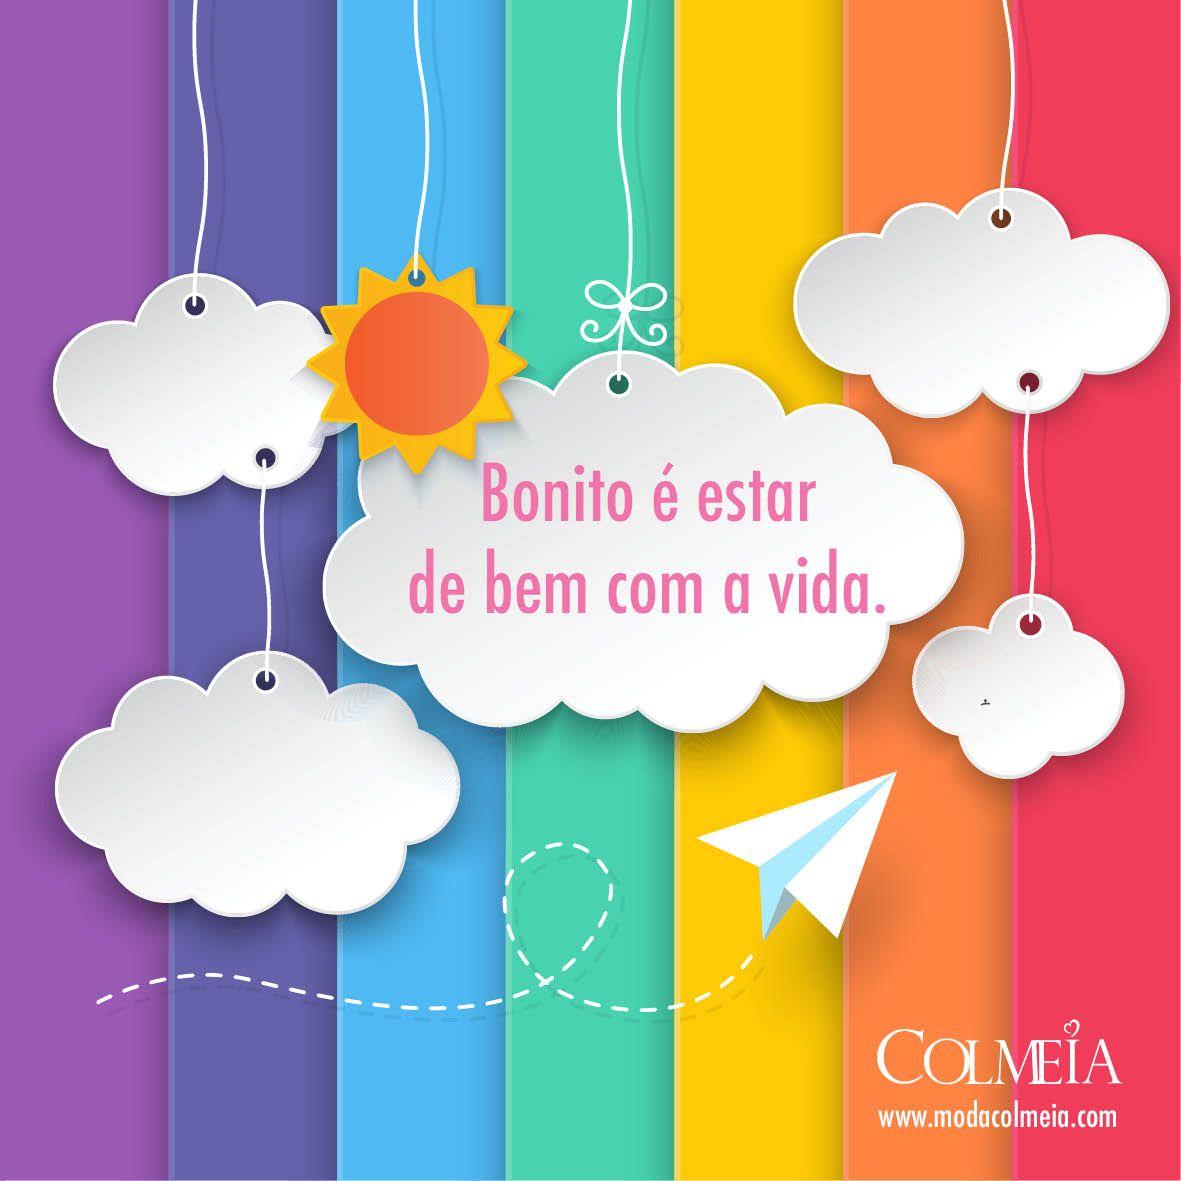 Bomdia Quotes Frases Inspiraa A O Inspiration Words Palavras